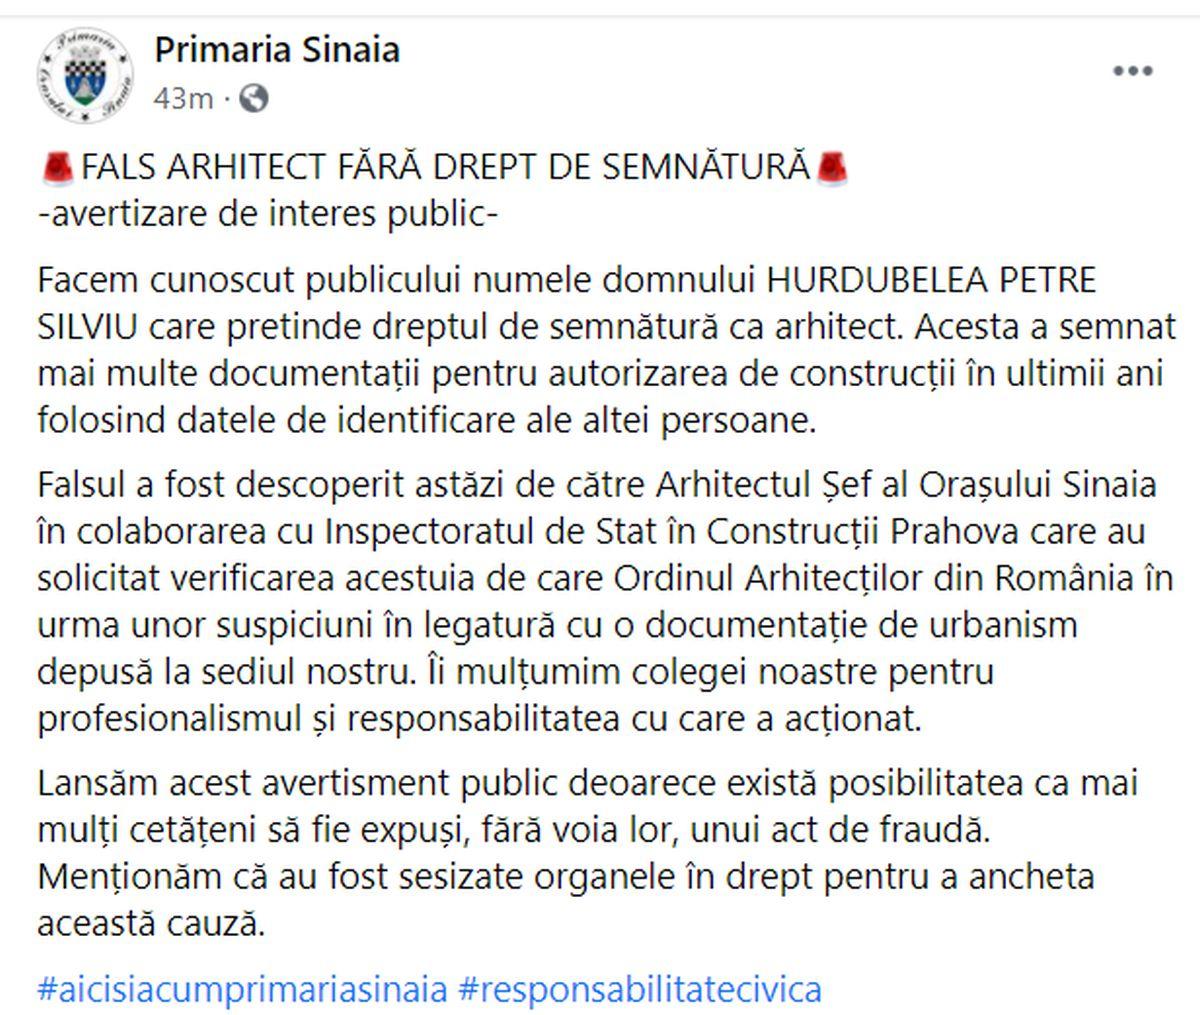 Primăria Sinaia a denunțat la Poliție un fals arhitect